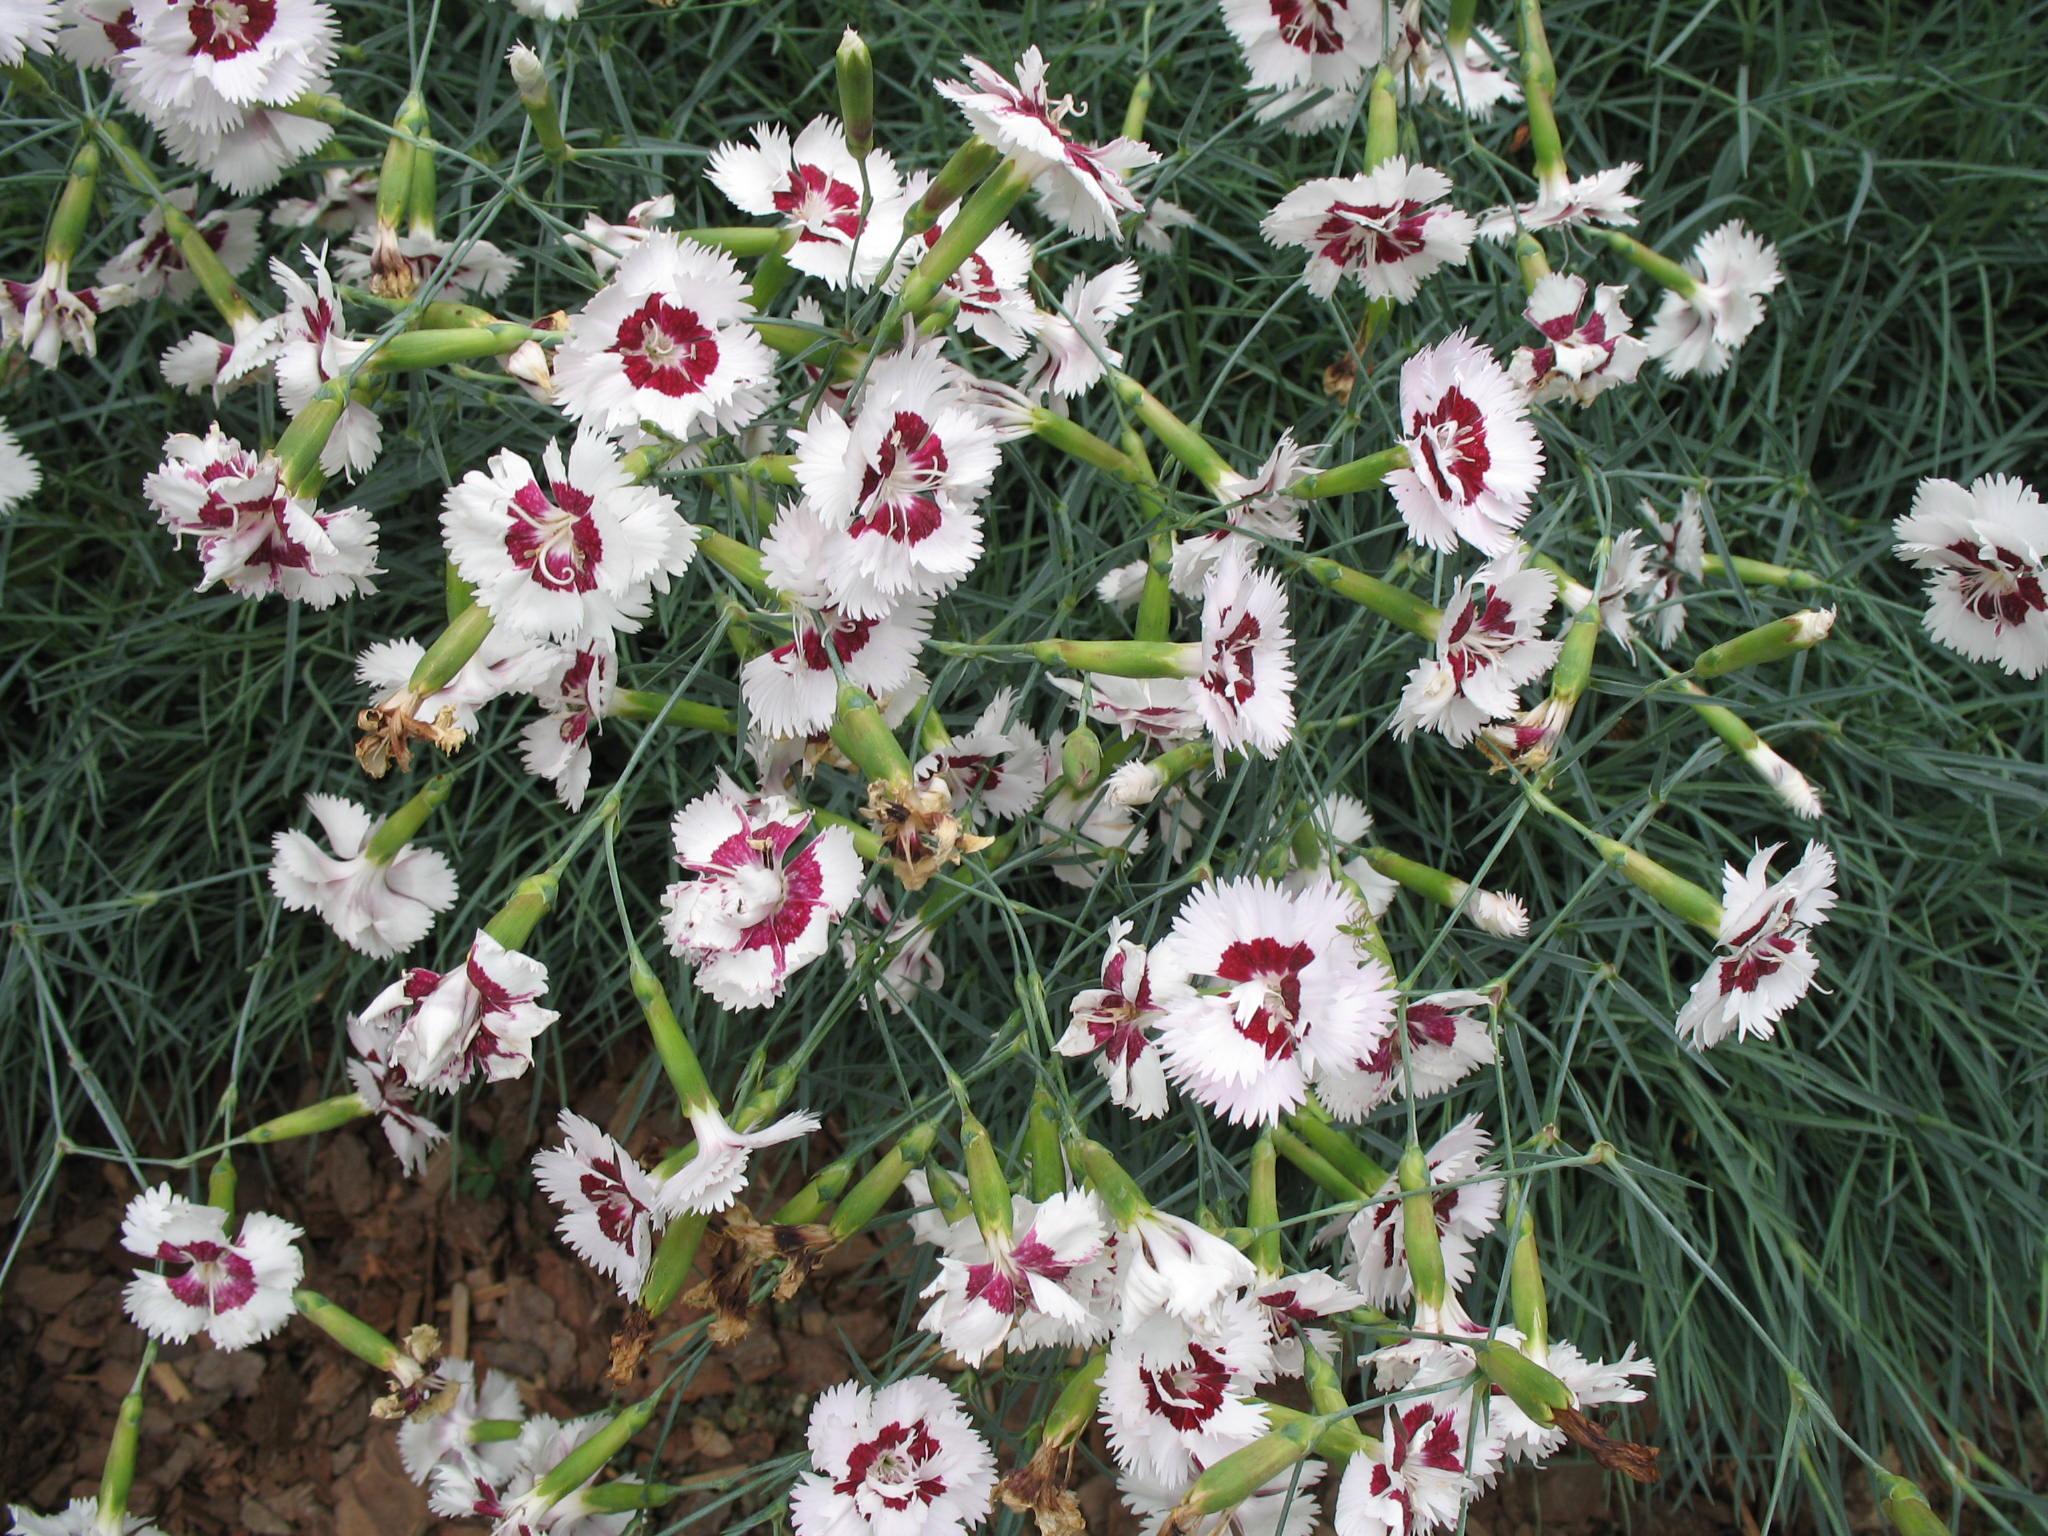 Dianthus 'Lady Granville' / Dianthus 'Lady Granville'